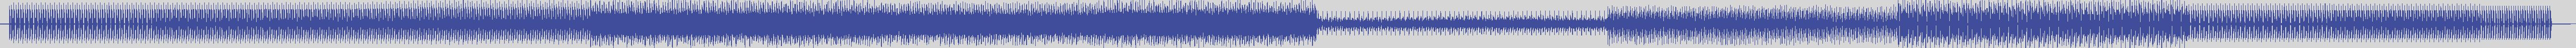 just_digital_records [JS1299] Tony Rollo - Trinity [Dub] audio wave form